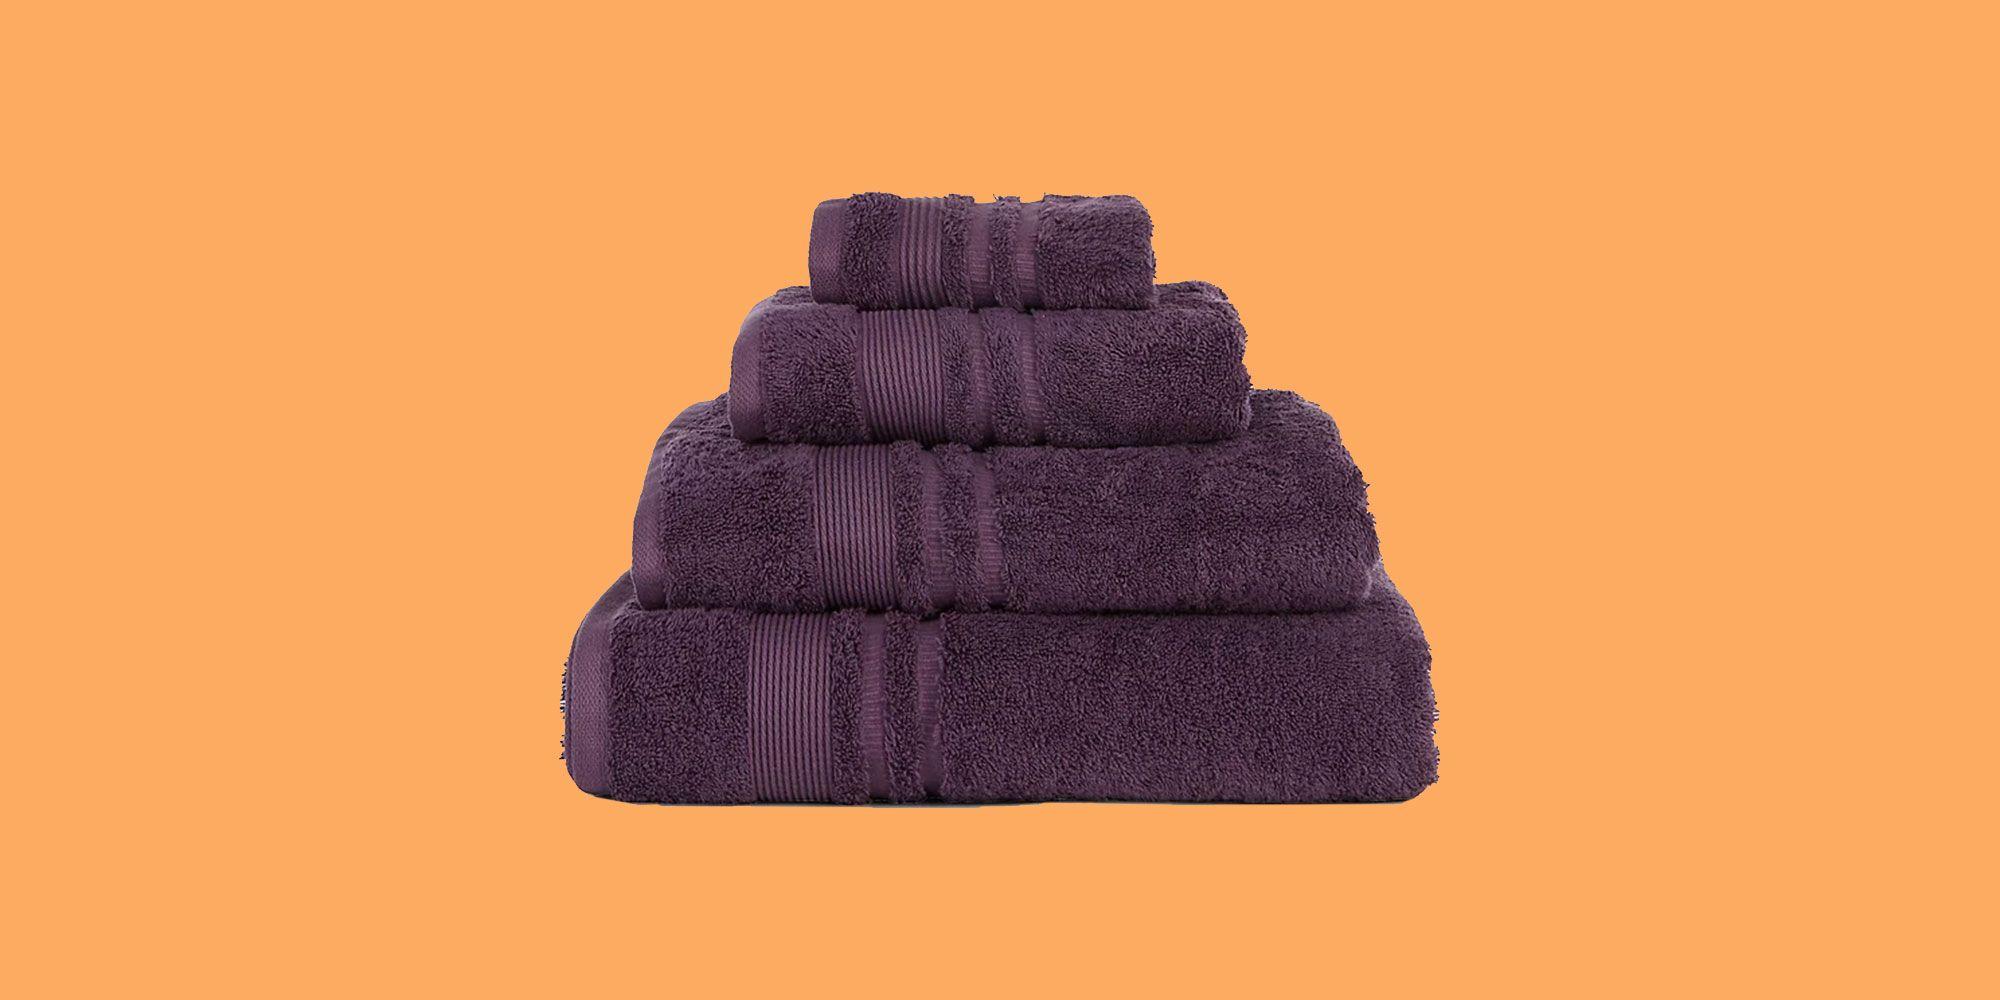 Asda Egyptian Cotton Bath Towel Review